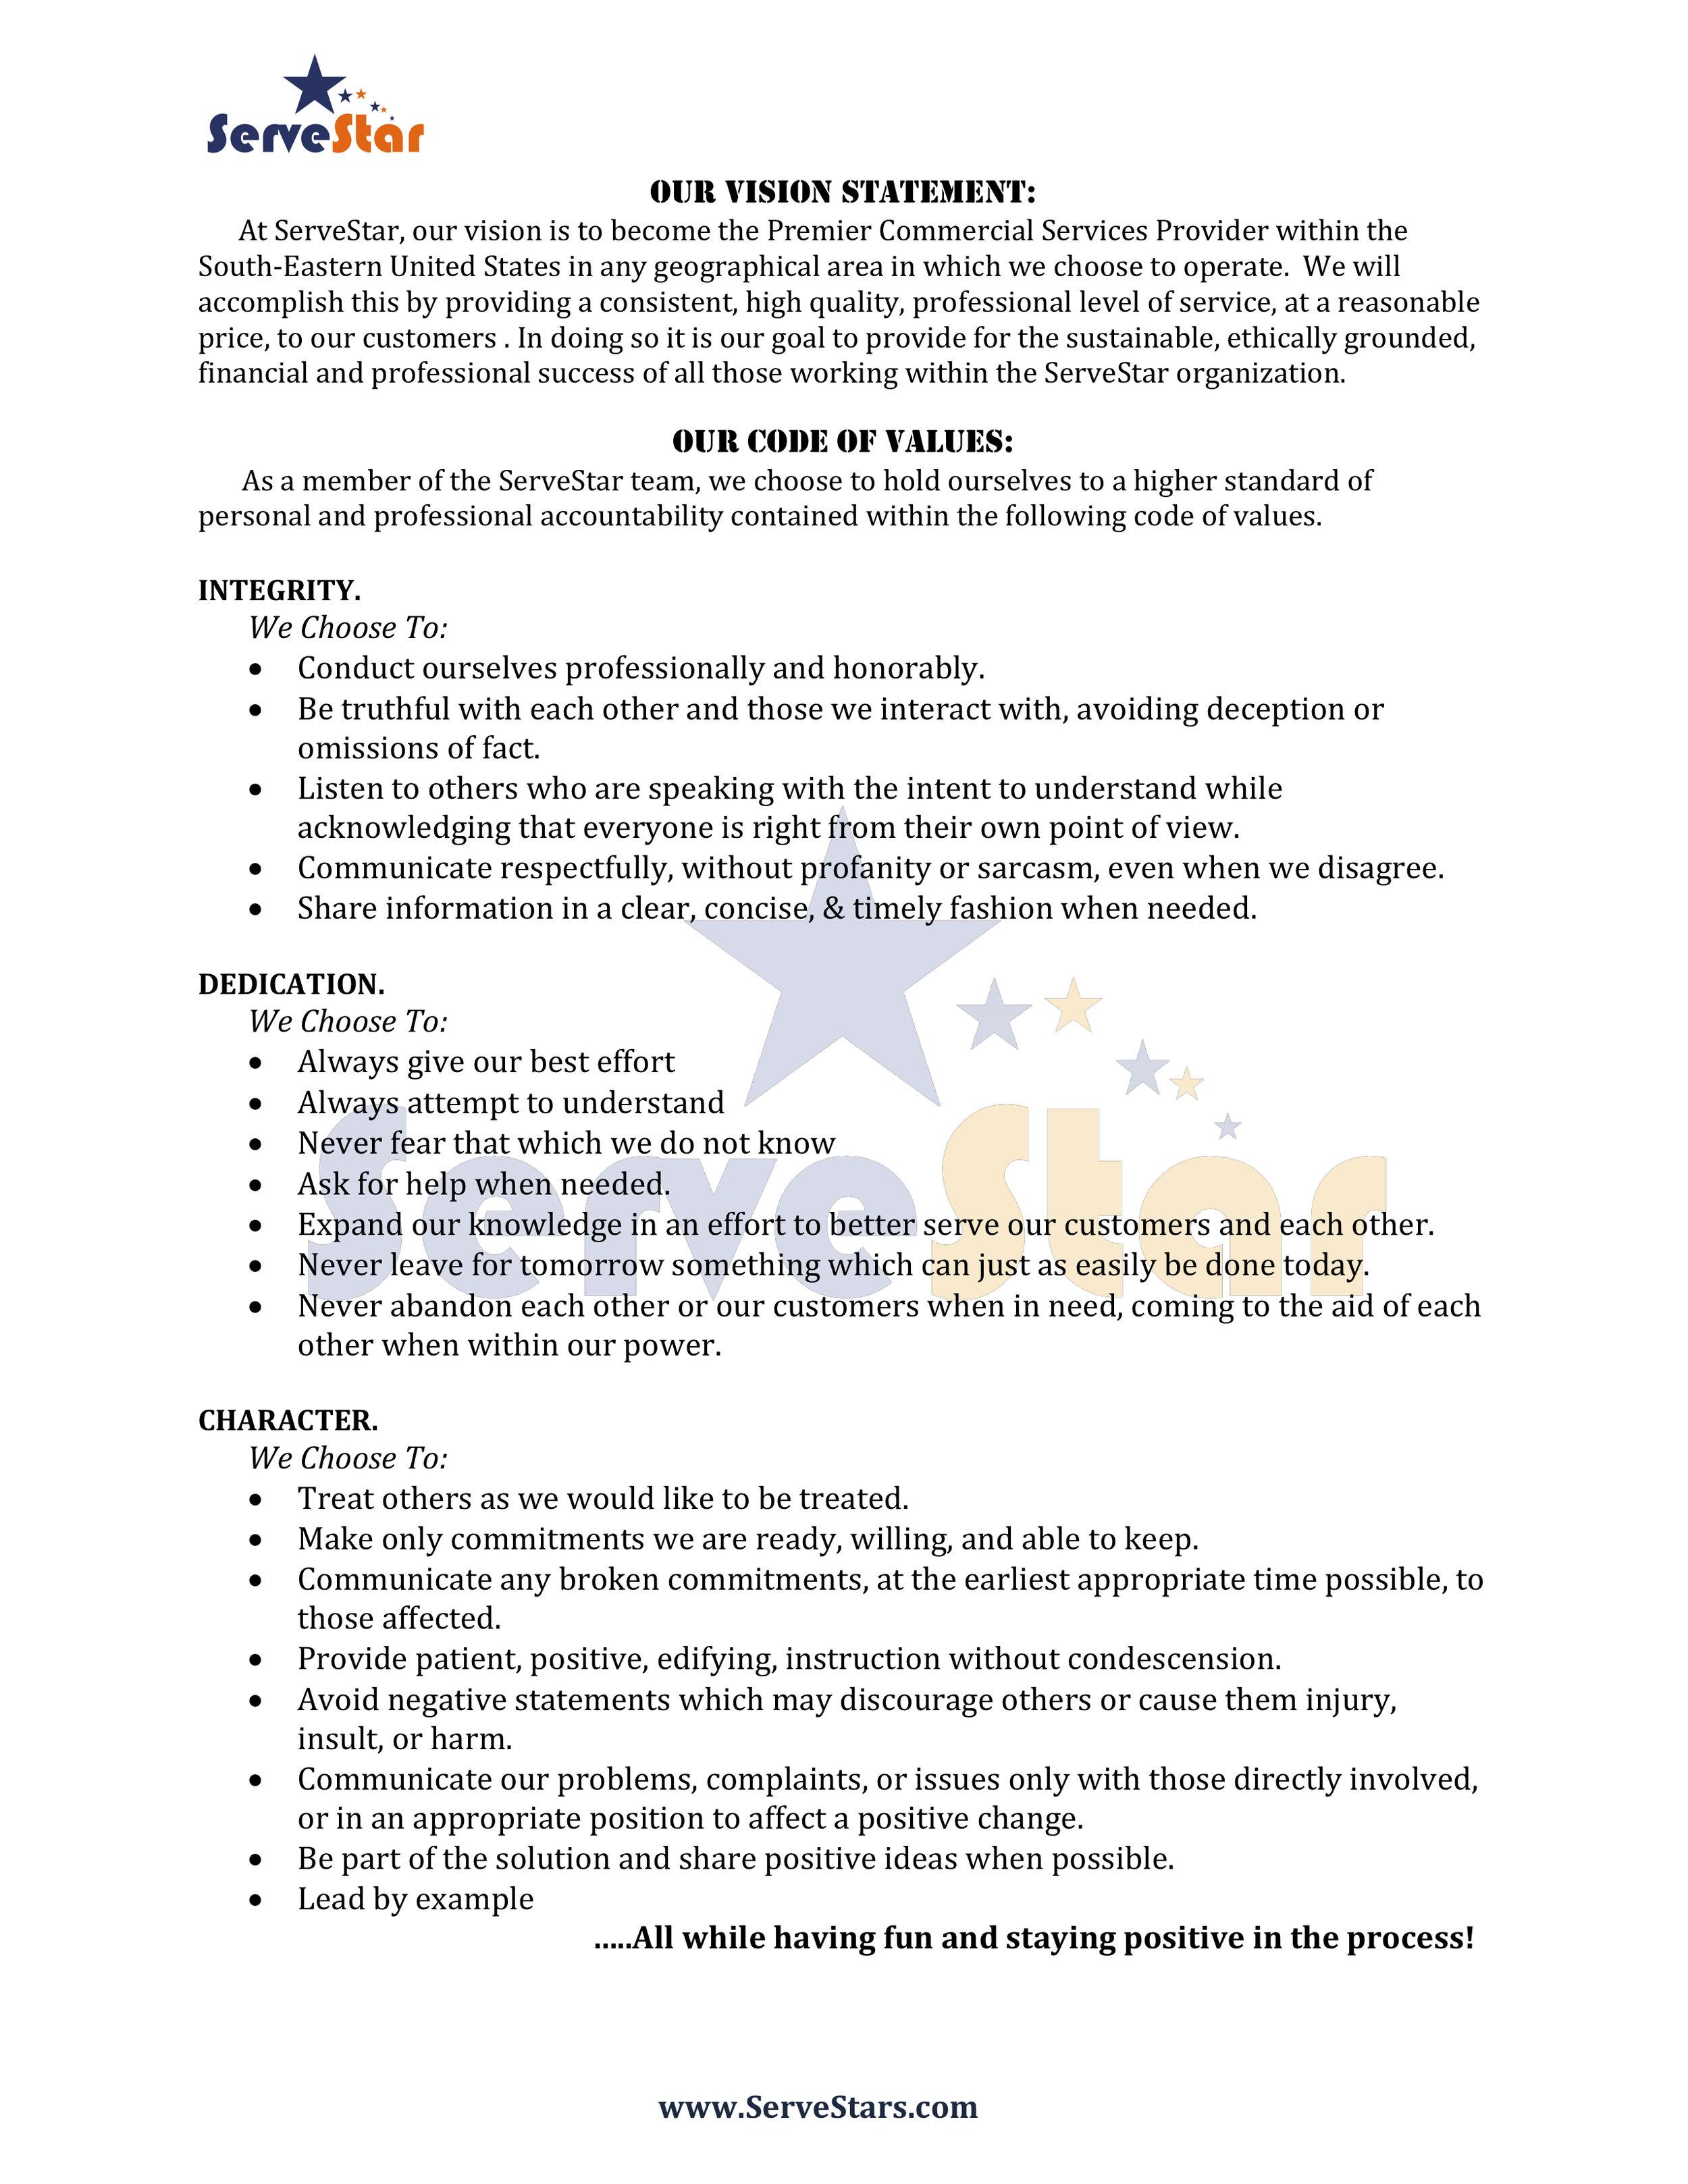 ServeStar Vision Statement & Code of Values.jpg